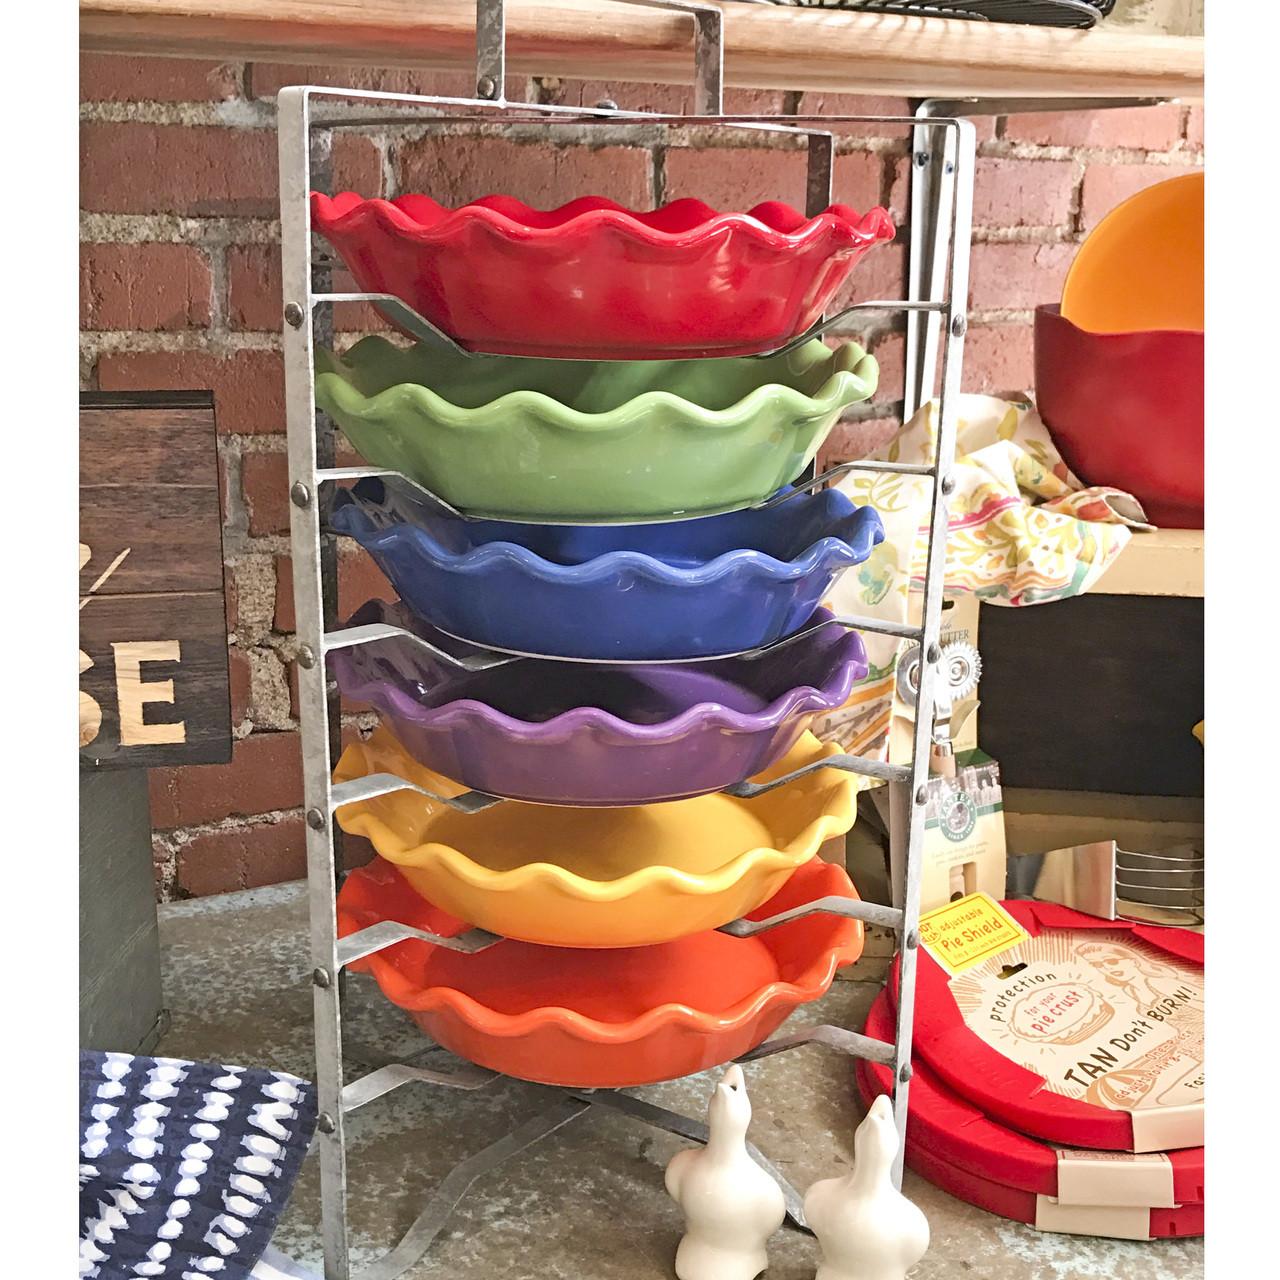 ... Metal Pie Plate Holder. Image 1  sc 1 st  bemadeinc & Metal Pie Plate Holder - Be Made